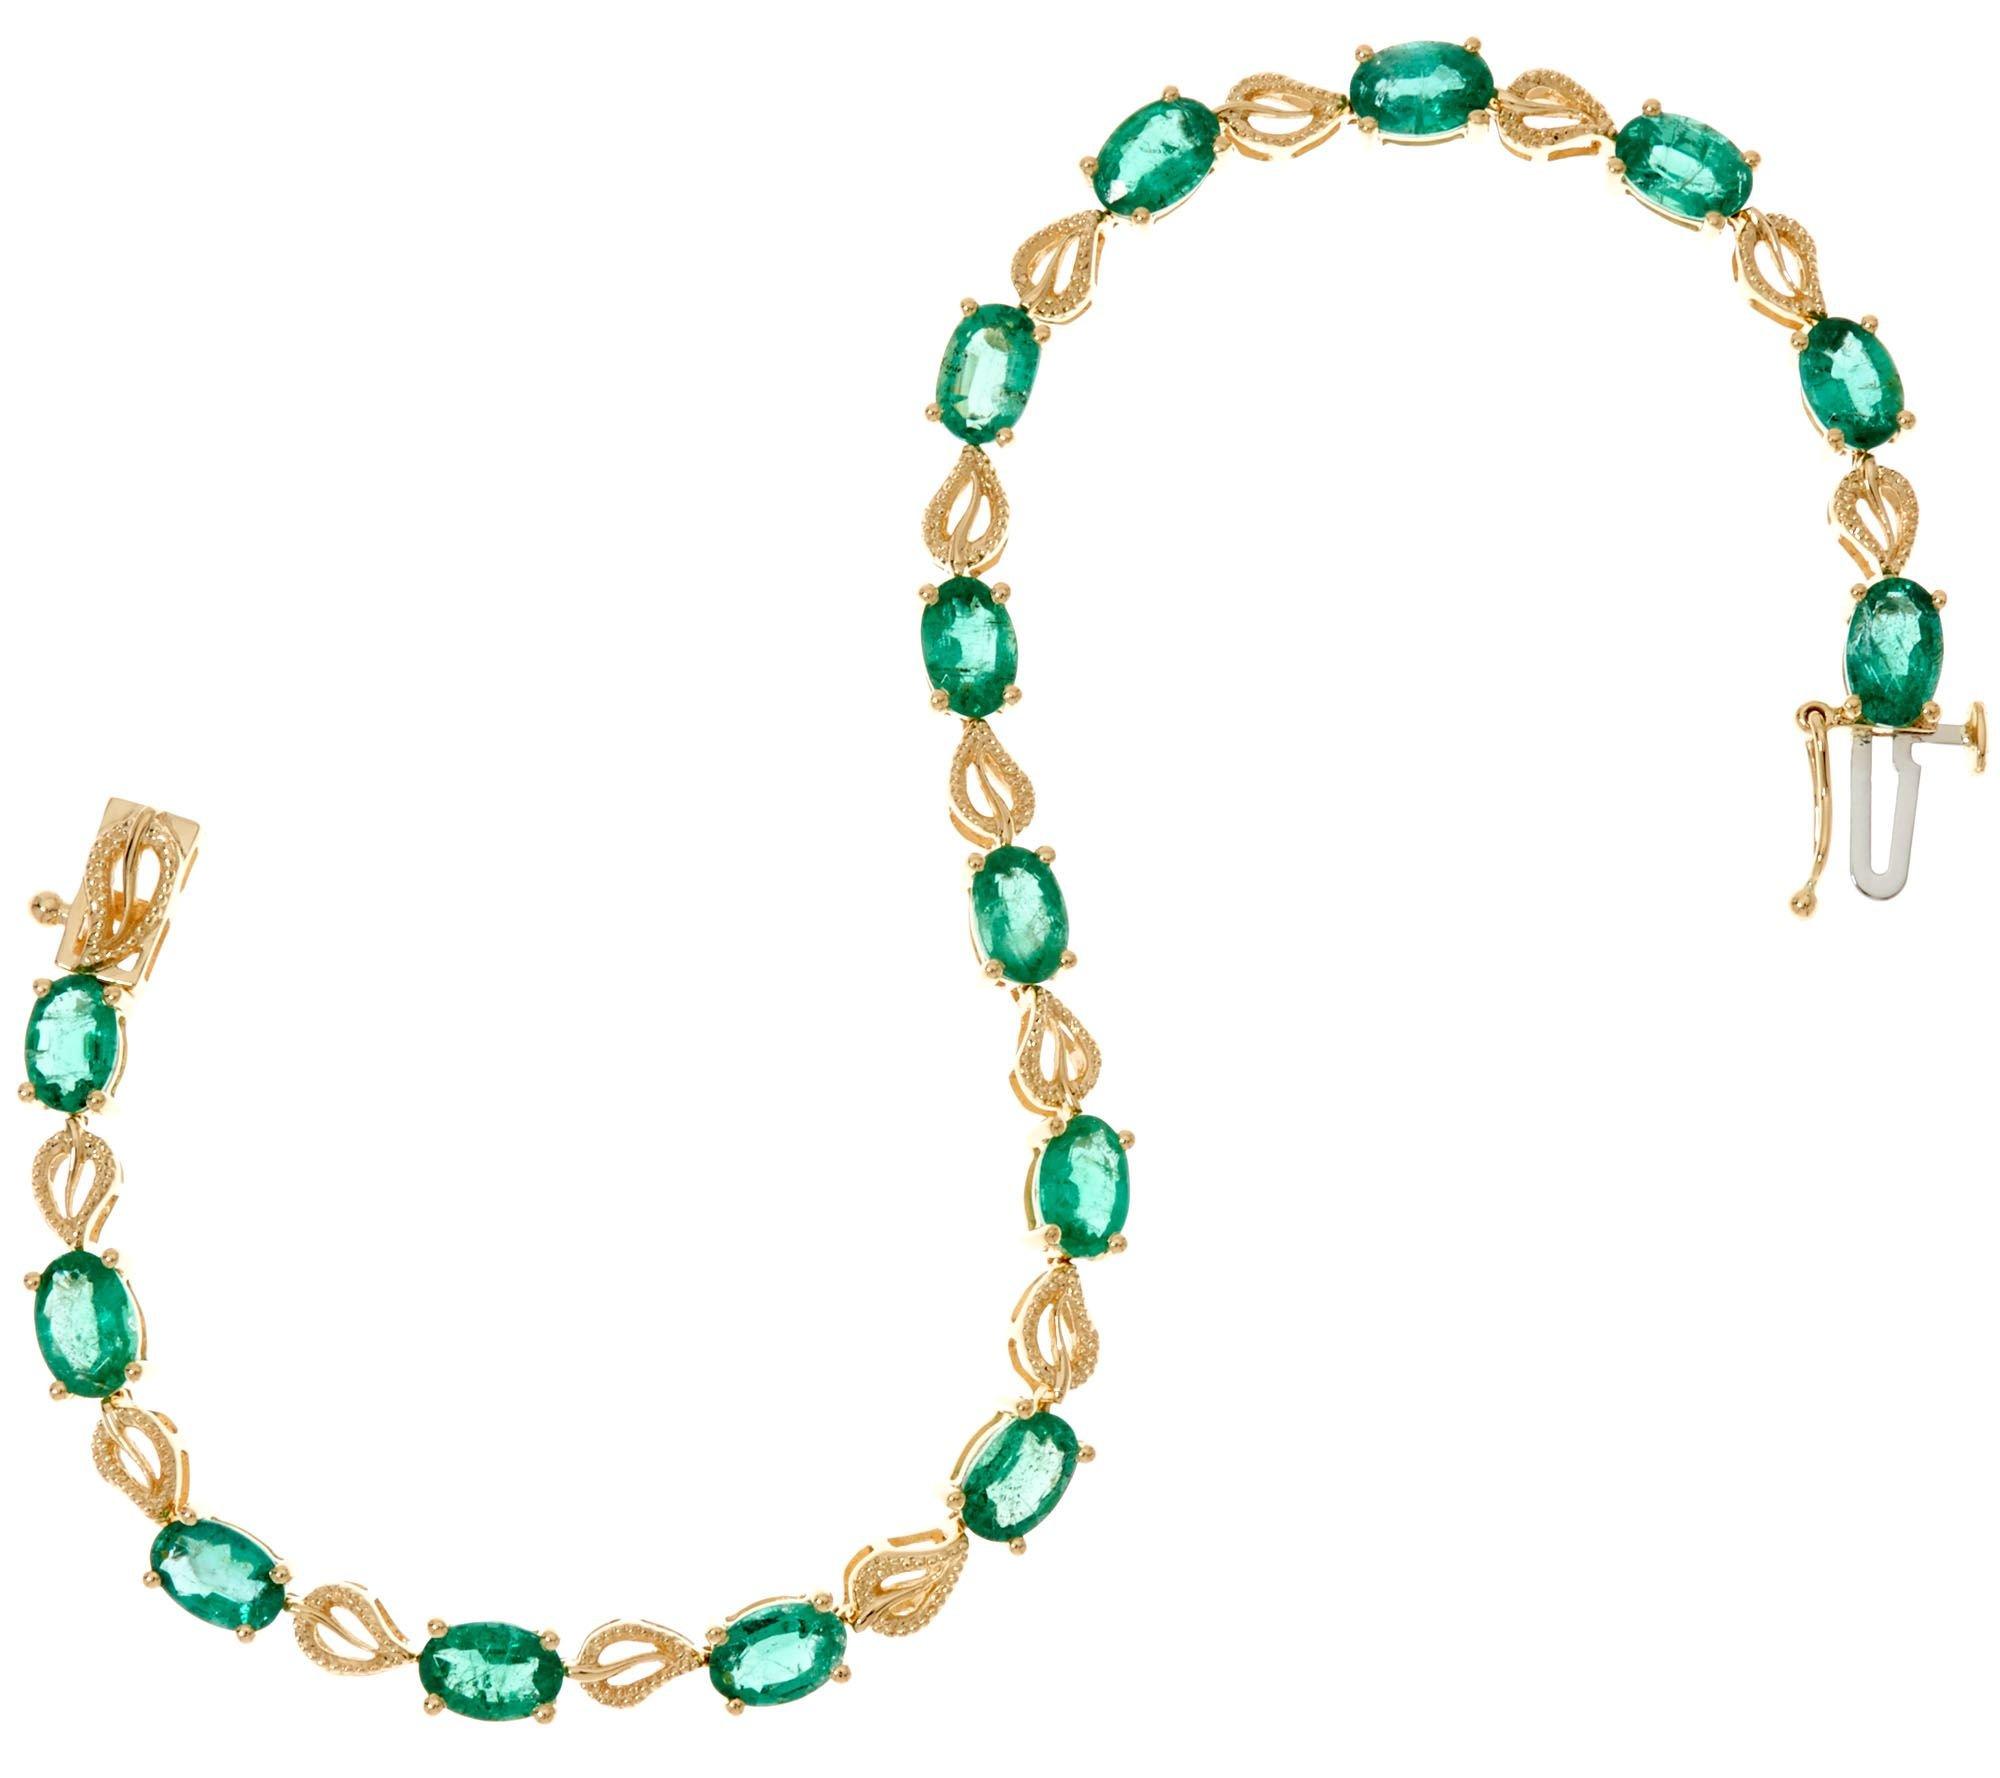 Silvercz Jewels 7.50 Carat Green Emerald Leaf Design Tennis Bracelet, 14K Yellow Gold Plated by Silvercz Jewels